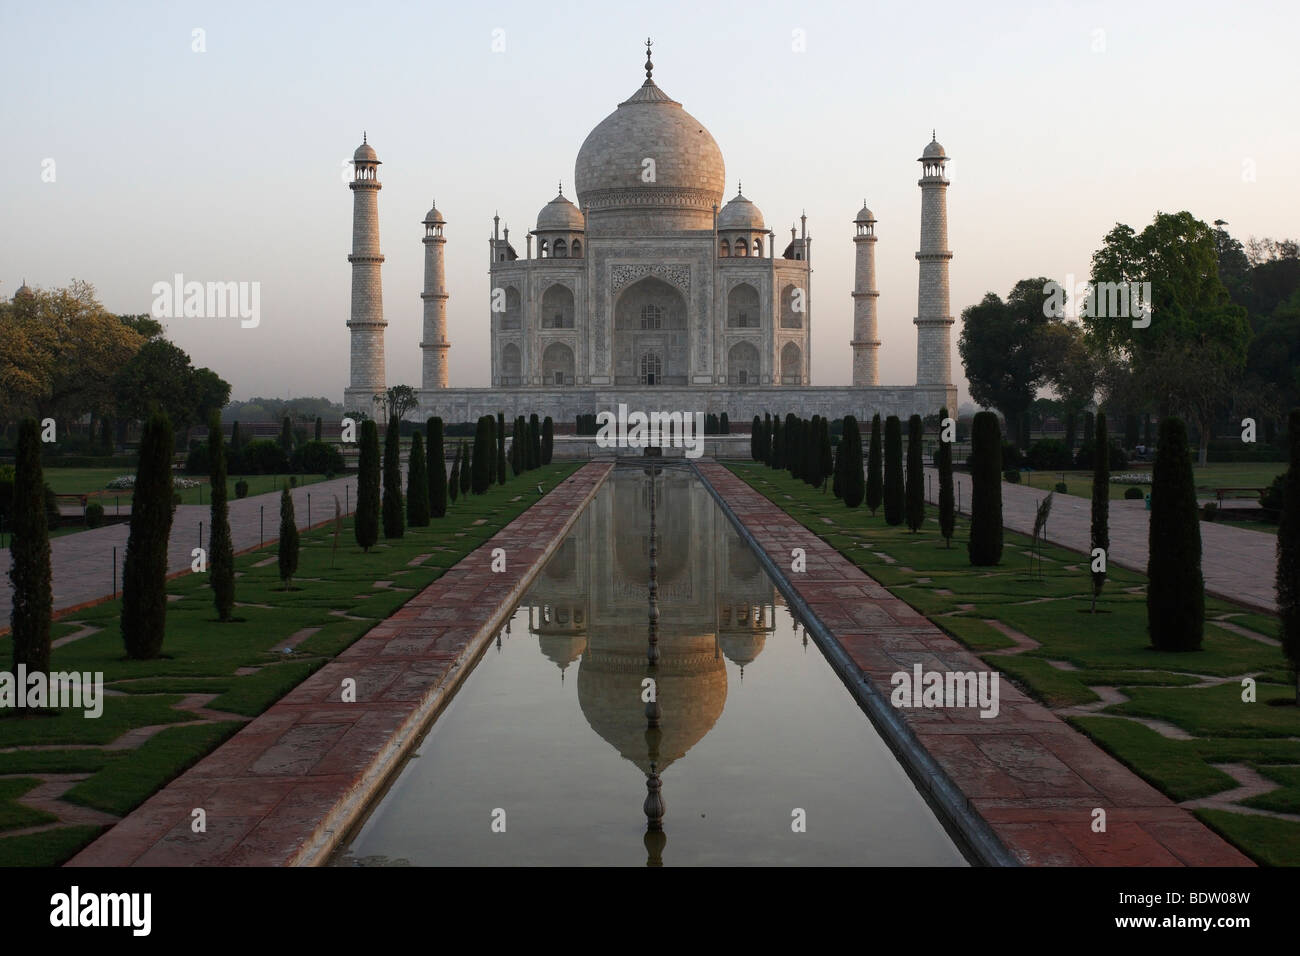 Taj Mahal, Weltberuehmtes Mausoleum in Agra, Indien, Indien Stockbild